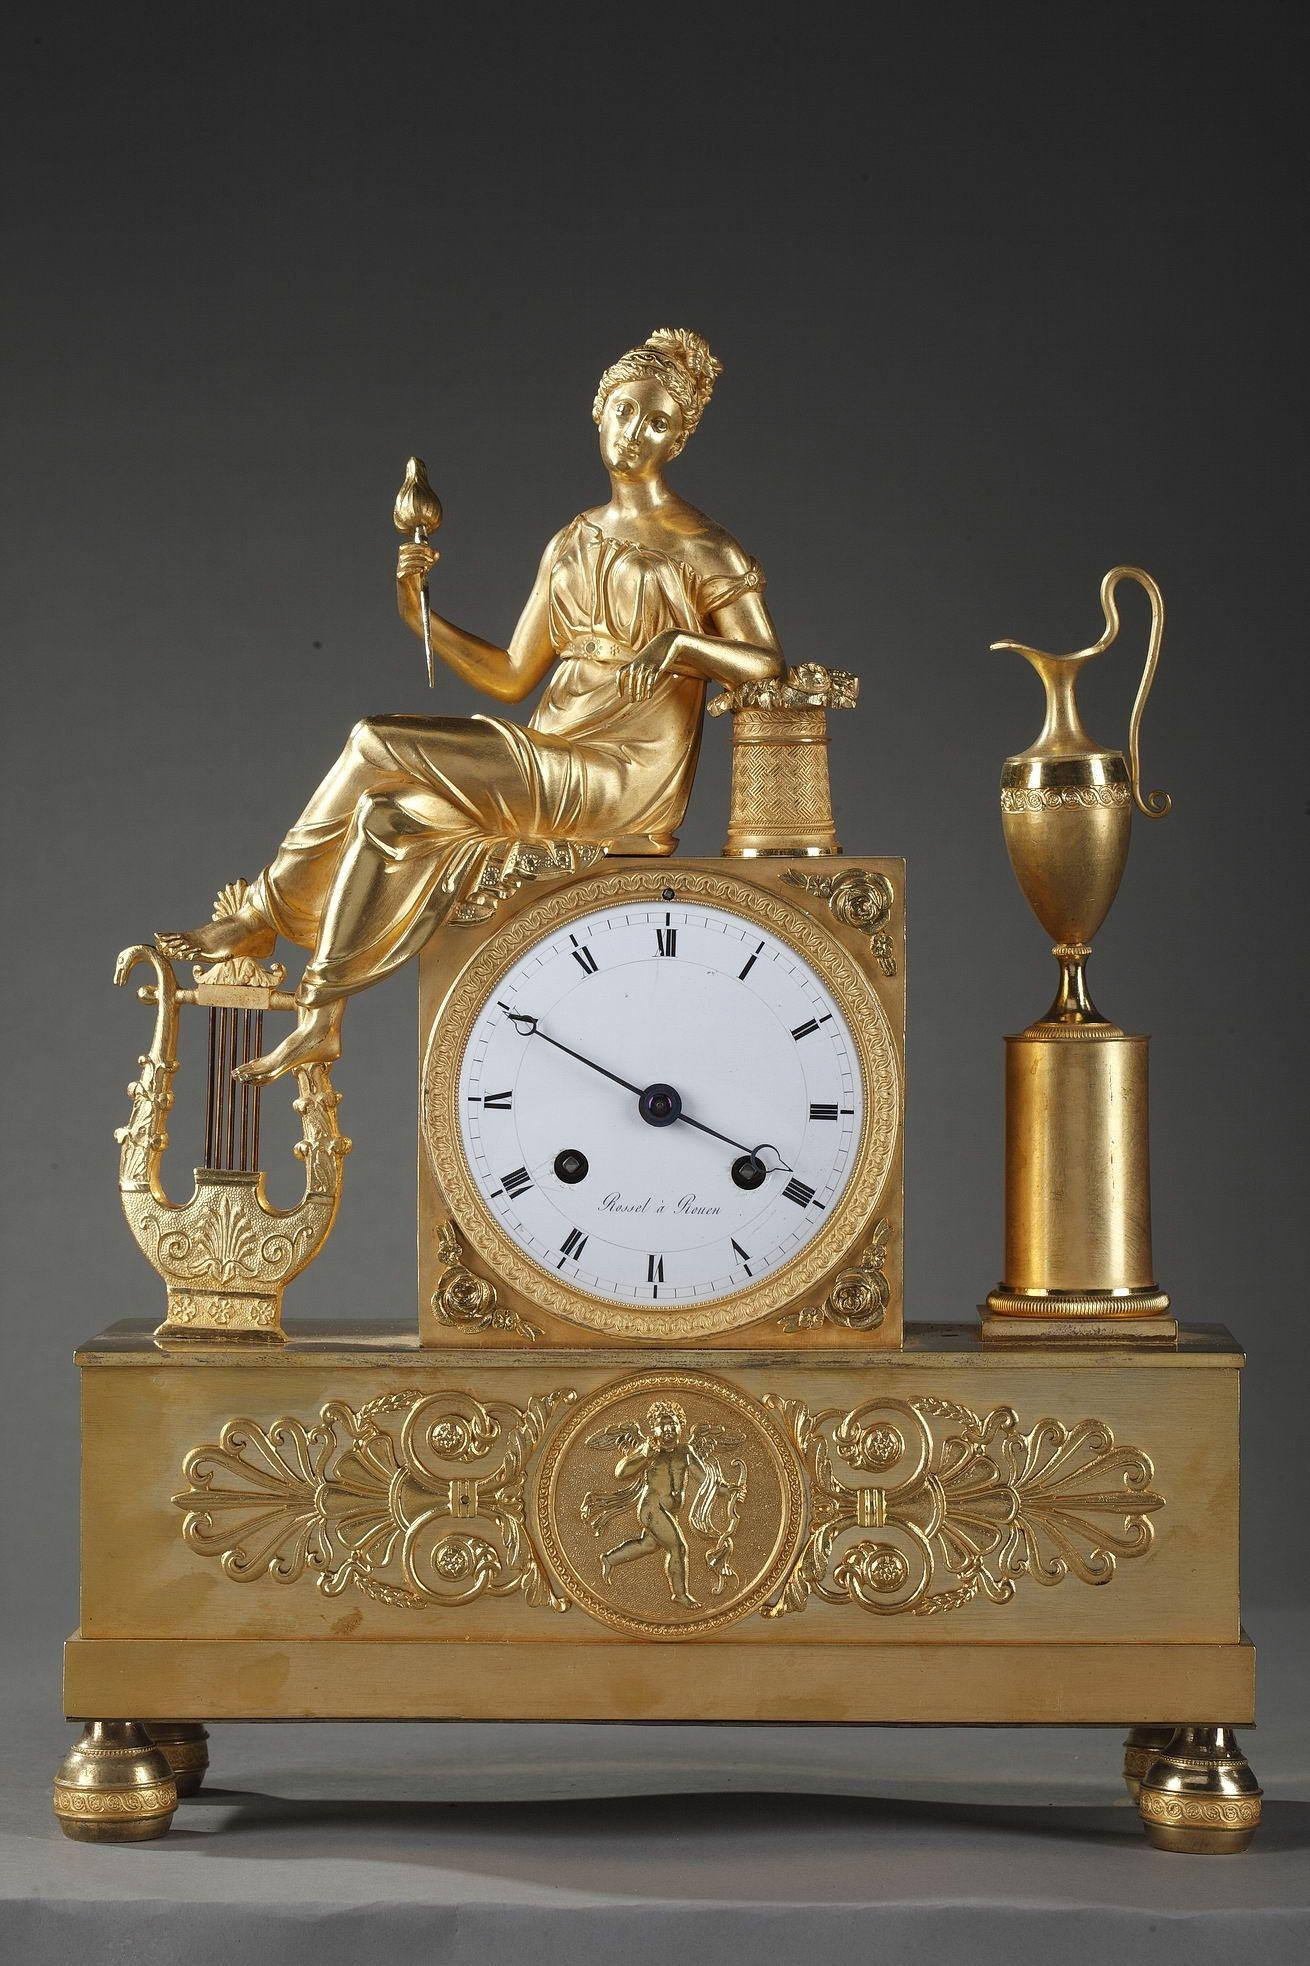 Empire Clock The Spinner By Rossel In Rouen Pendulum Clock Clock Antique Clocks